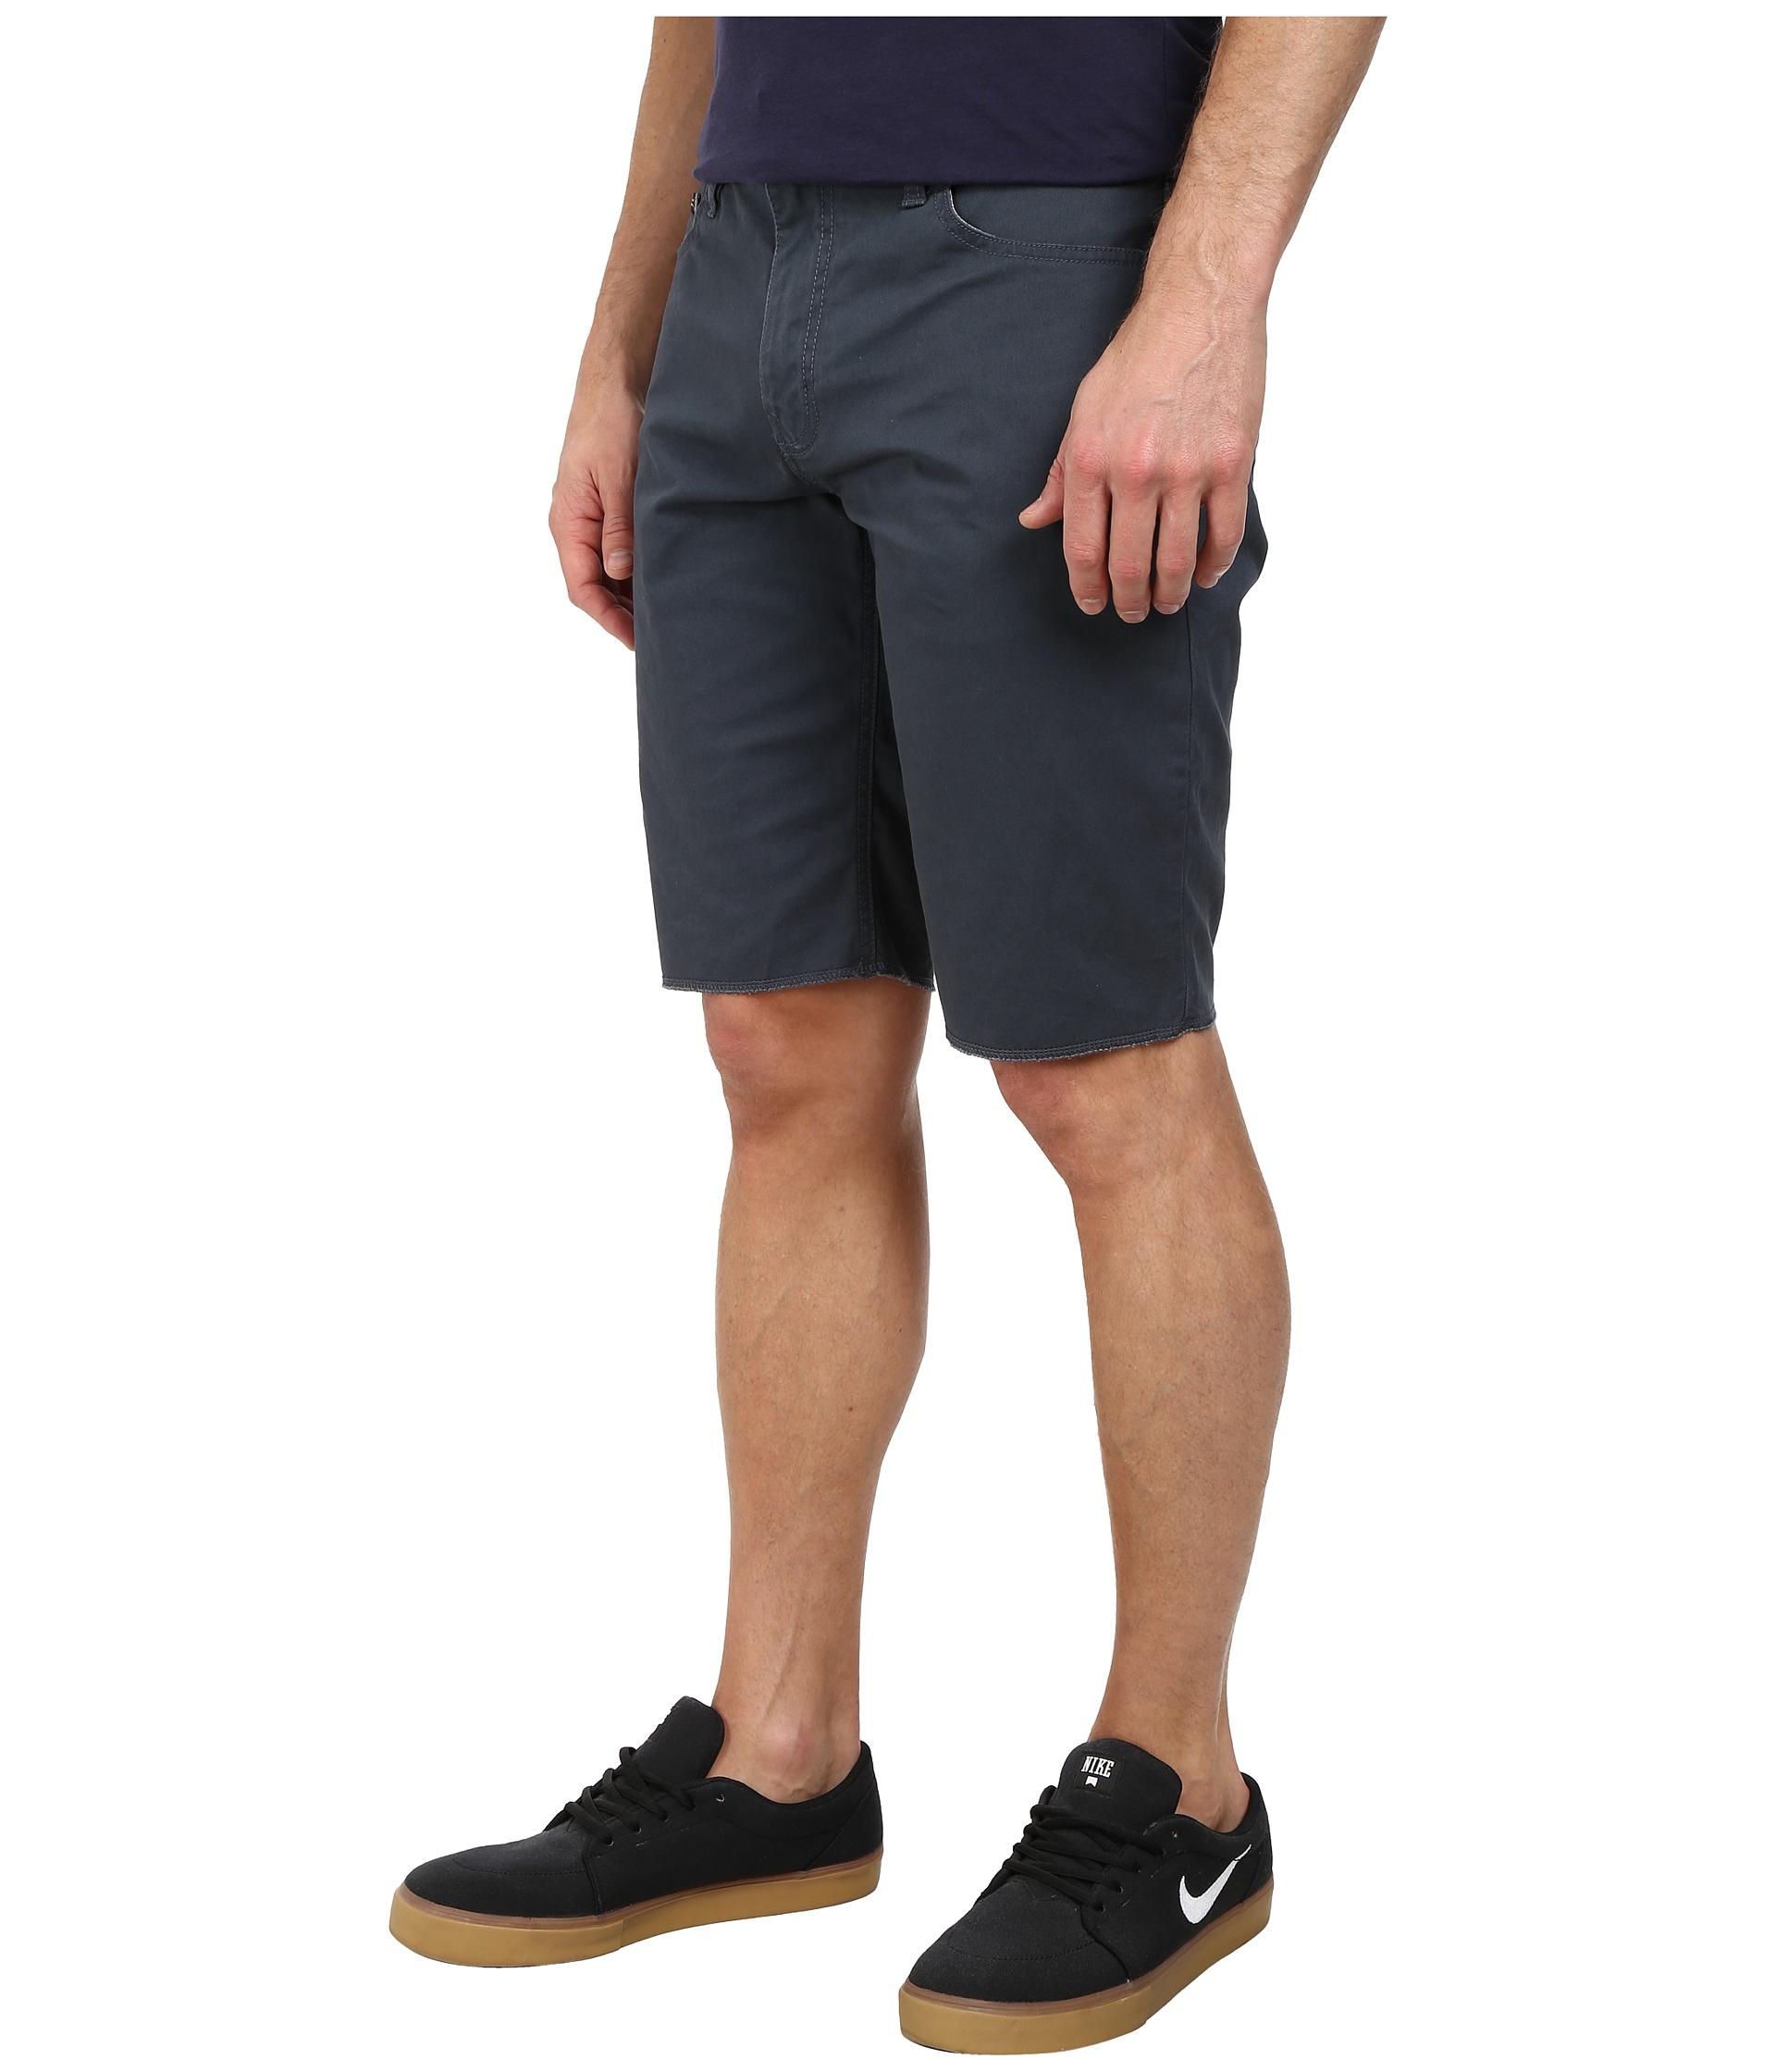 97ca8525f145 Lyst - Nike Sb Fremont Stretch Five-pocket Short in Gray for Men